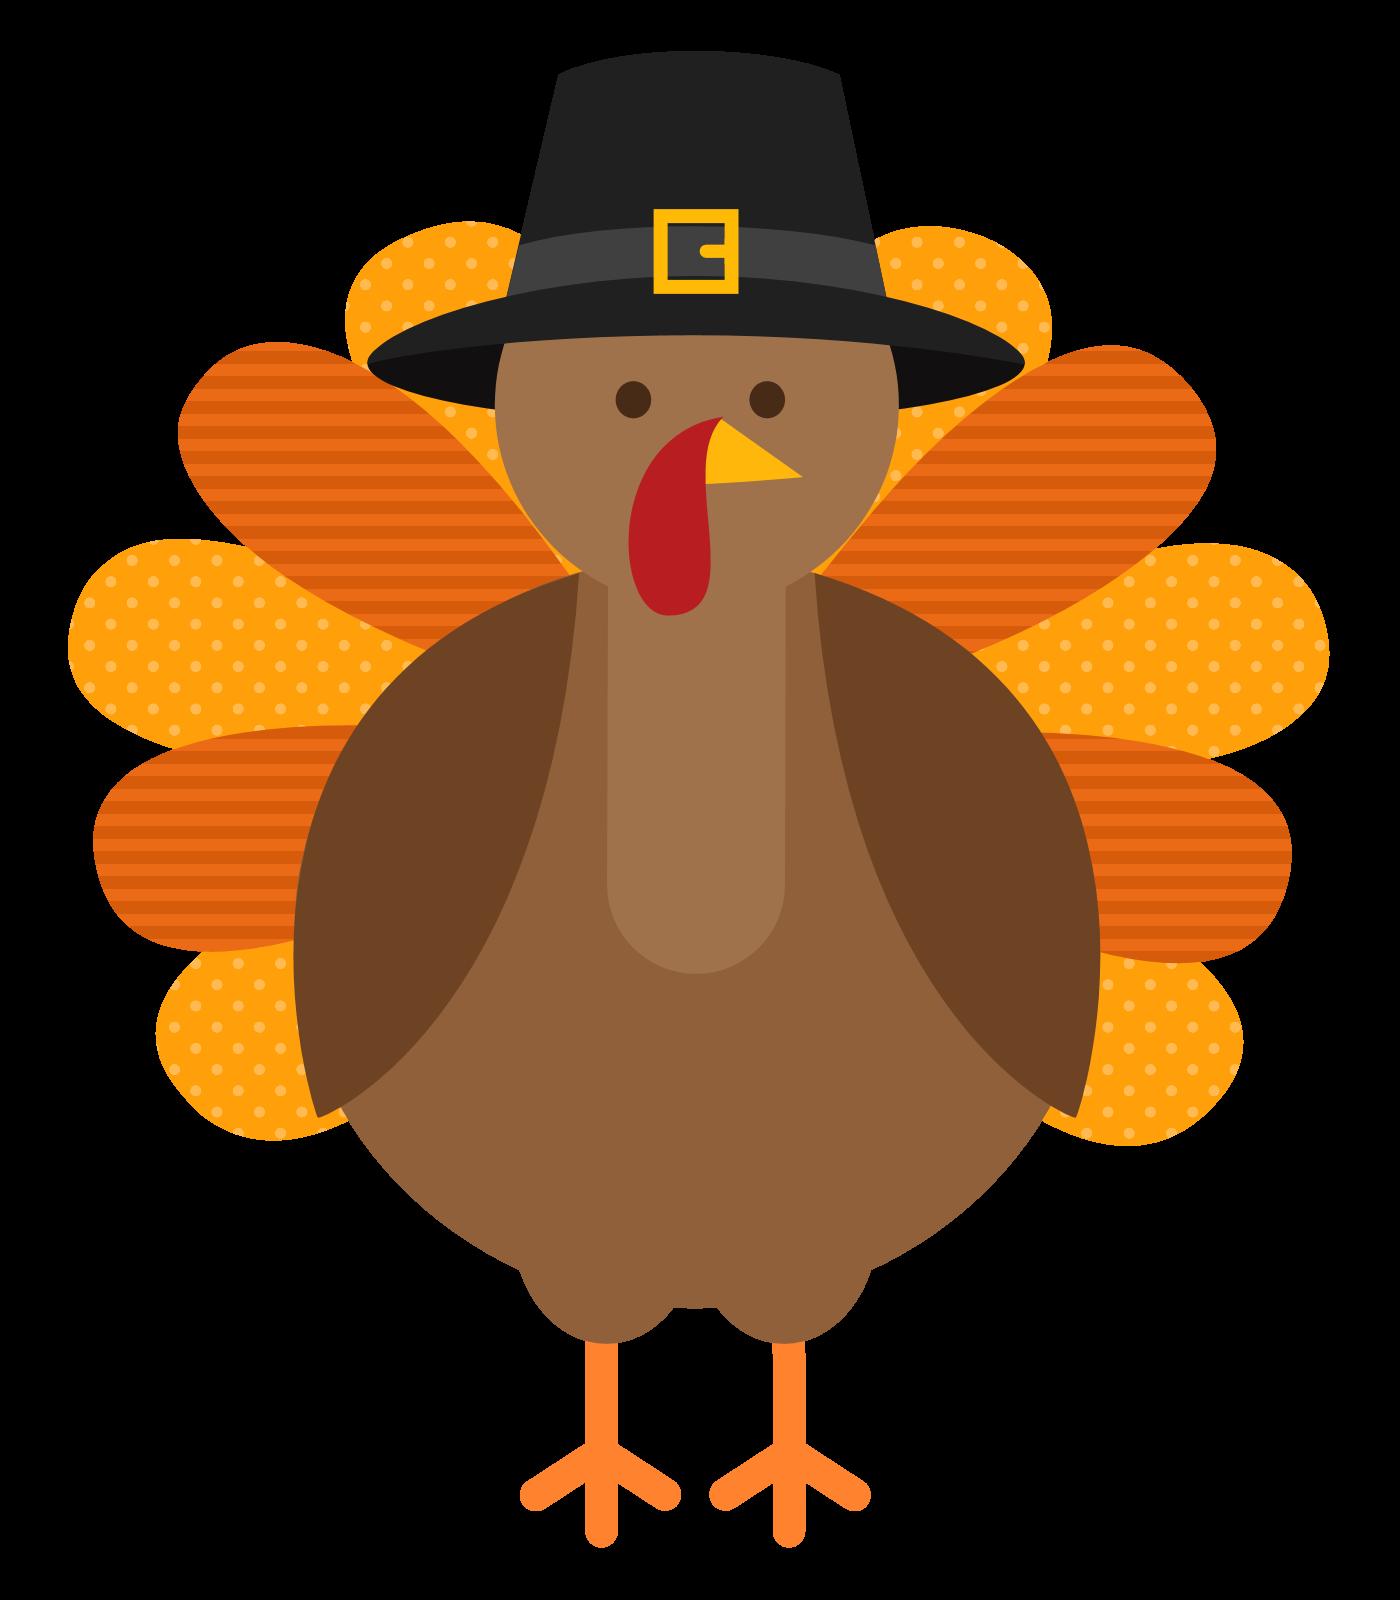 thanksgiving-clip-art-thanksgiving-clip-art-16